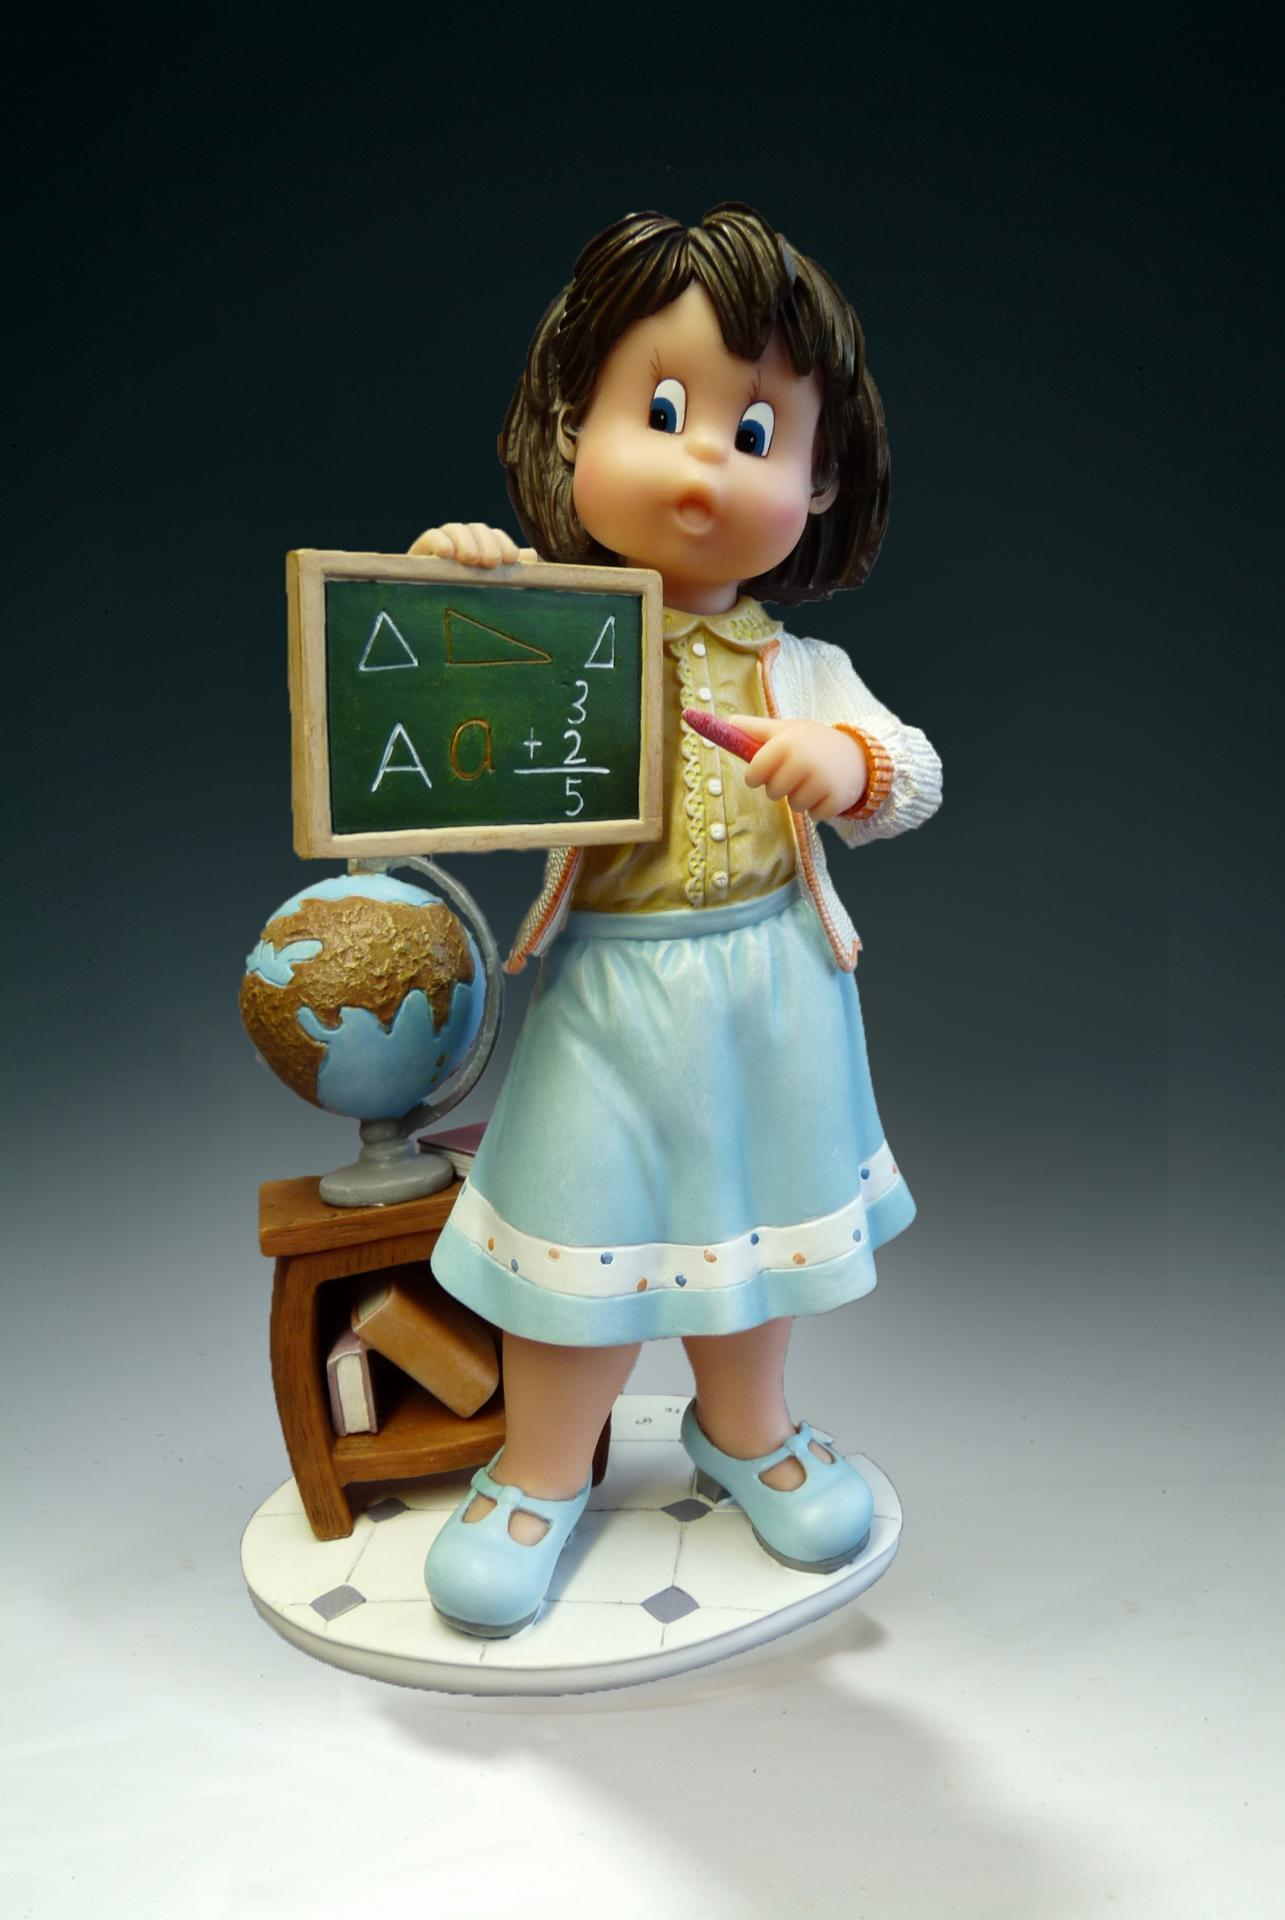 figura-mi-maestra-preferida-nadal-studio-coleccion-pequeños-tesoros-resina-serie-limitada-746753-14cm-lomejorsg.jpg